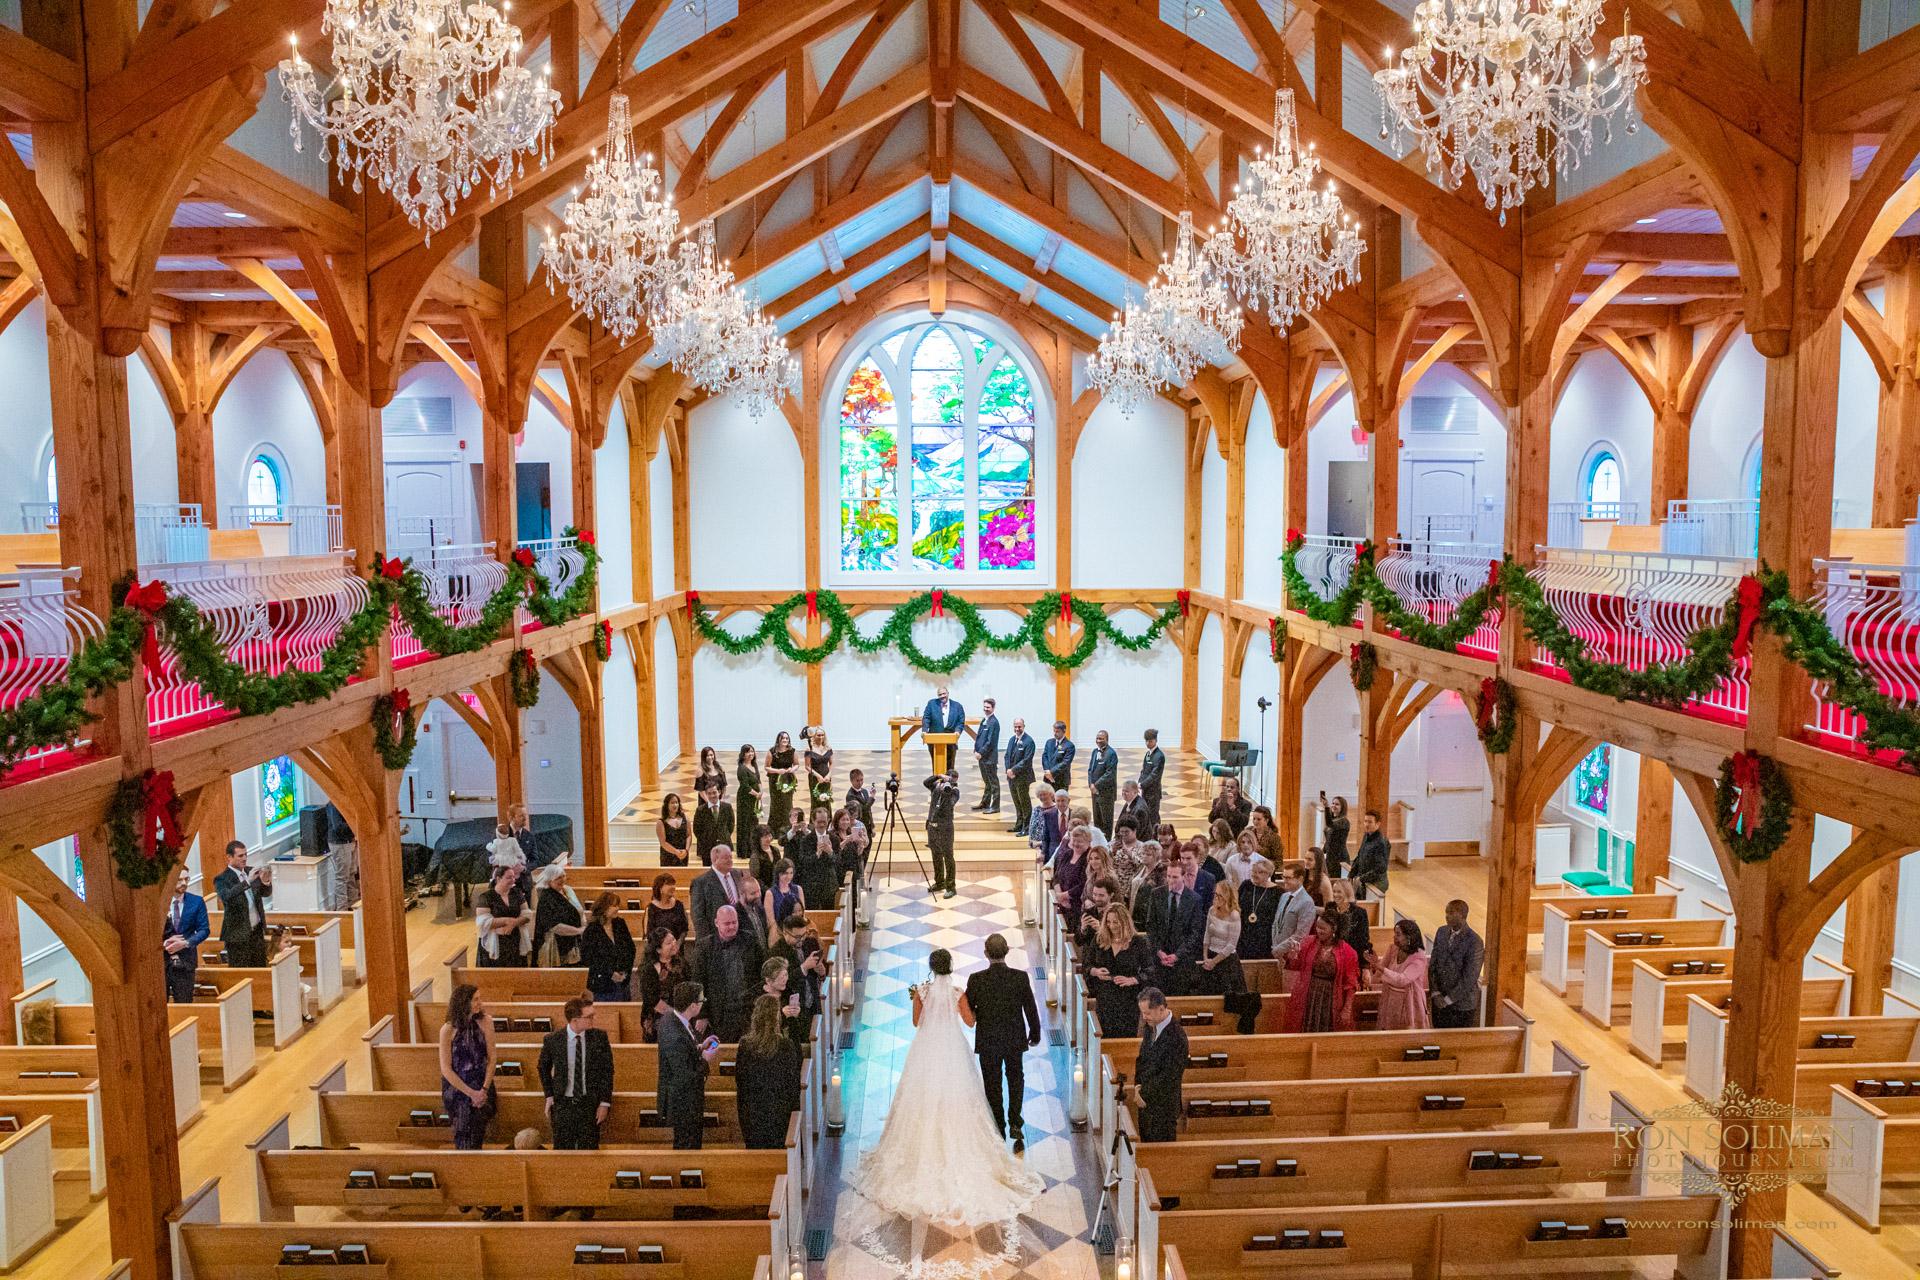 THE GREENBRIER RESORT WEDDING 29